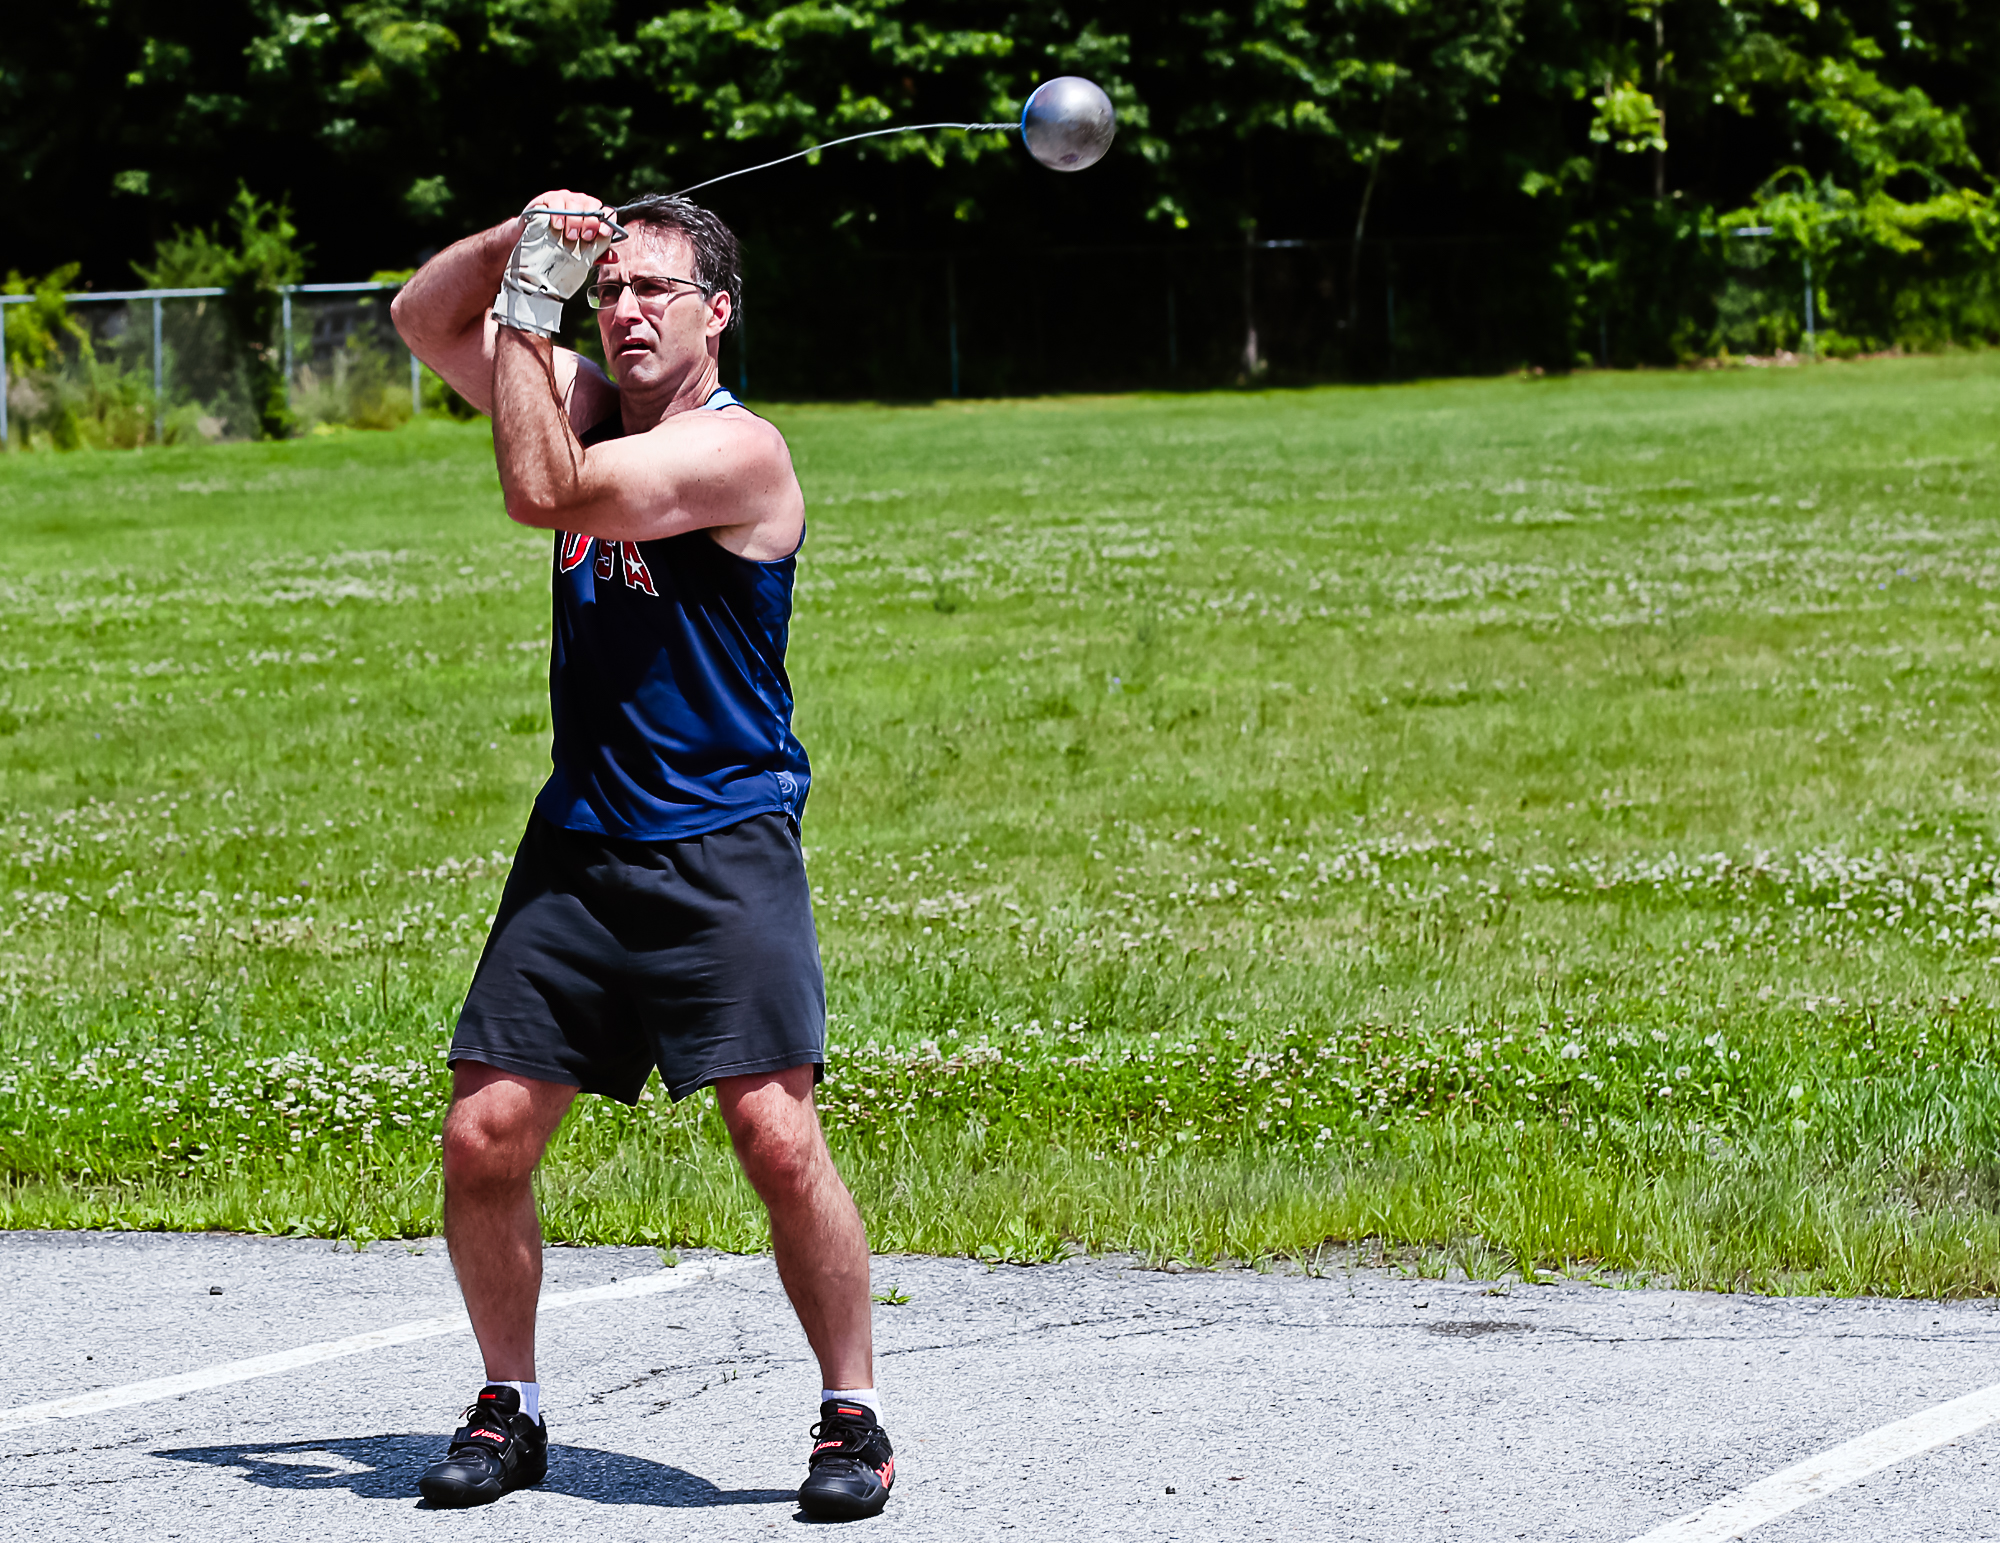 john-javelin-throwing-6.jpg